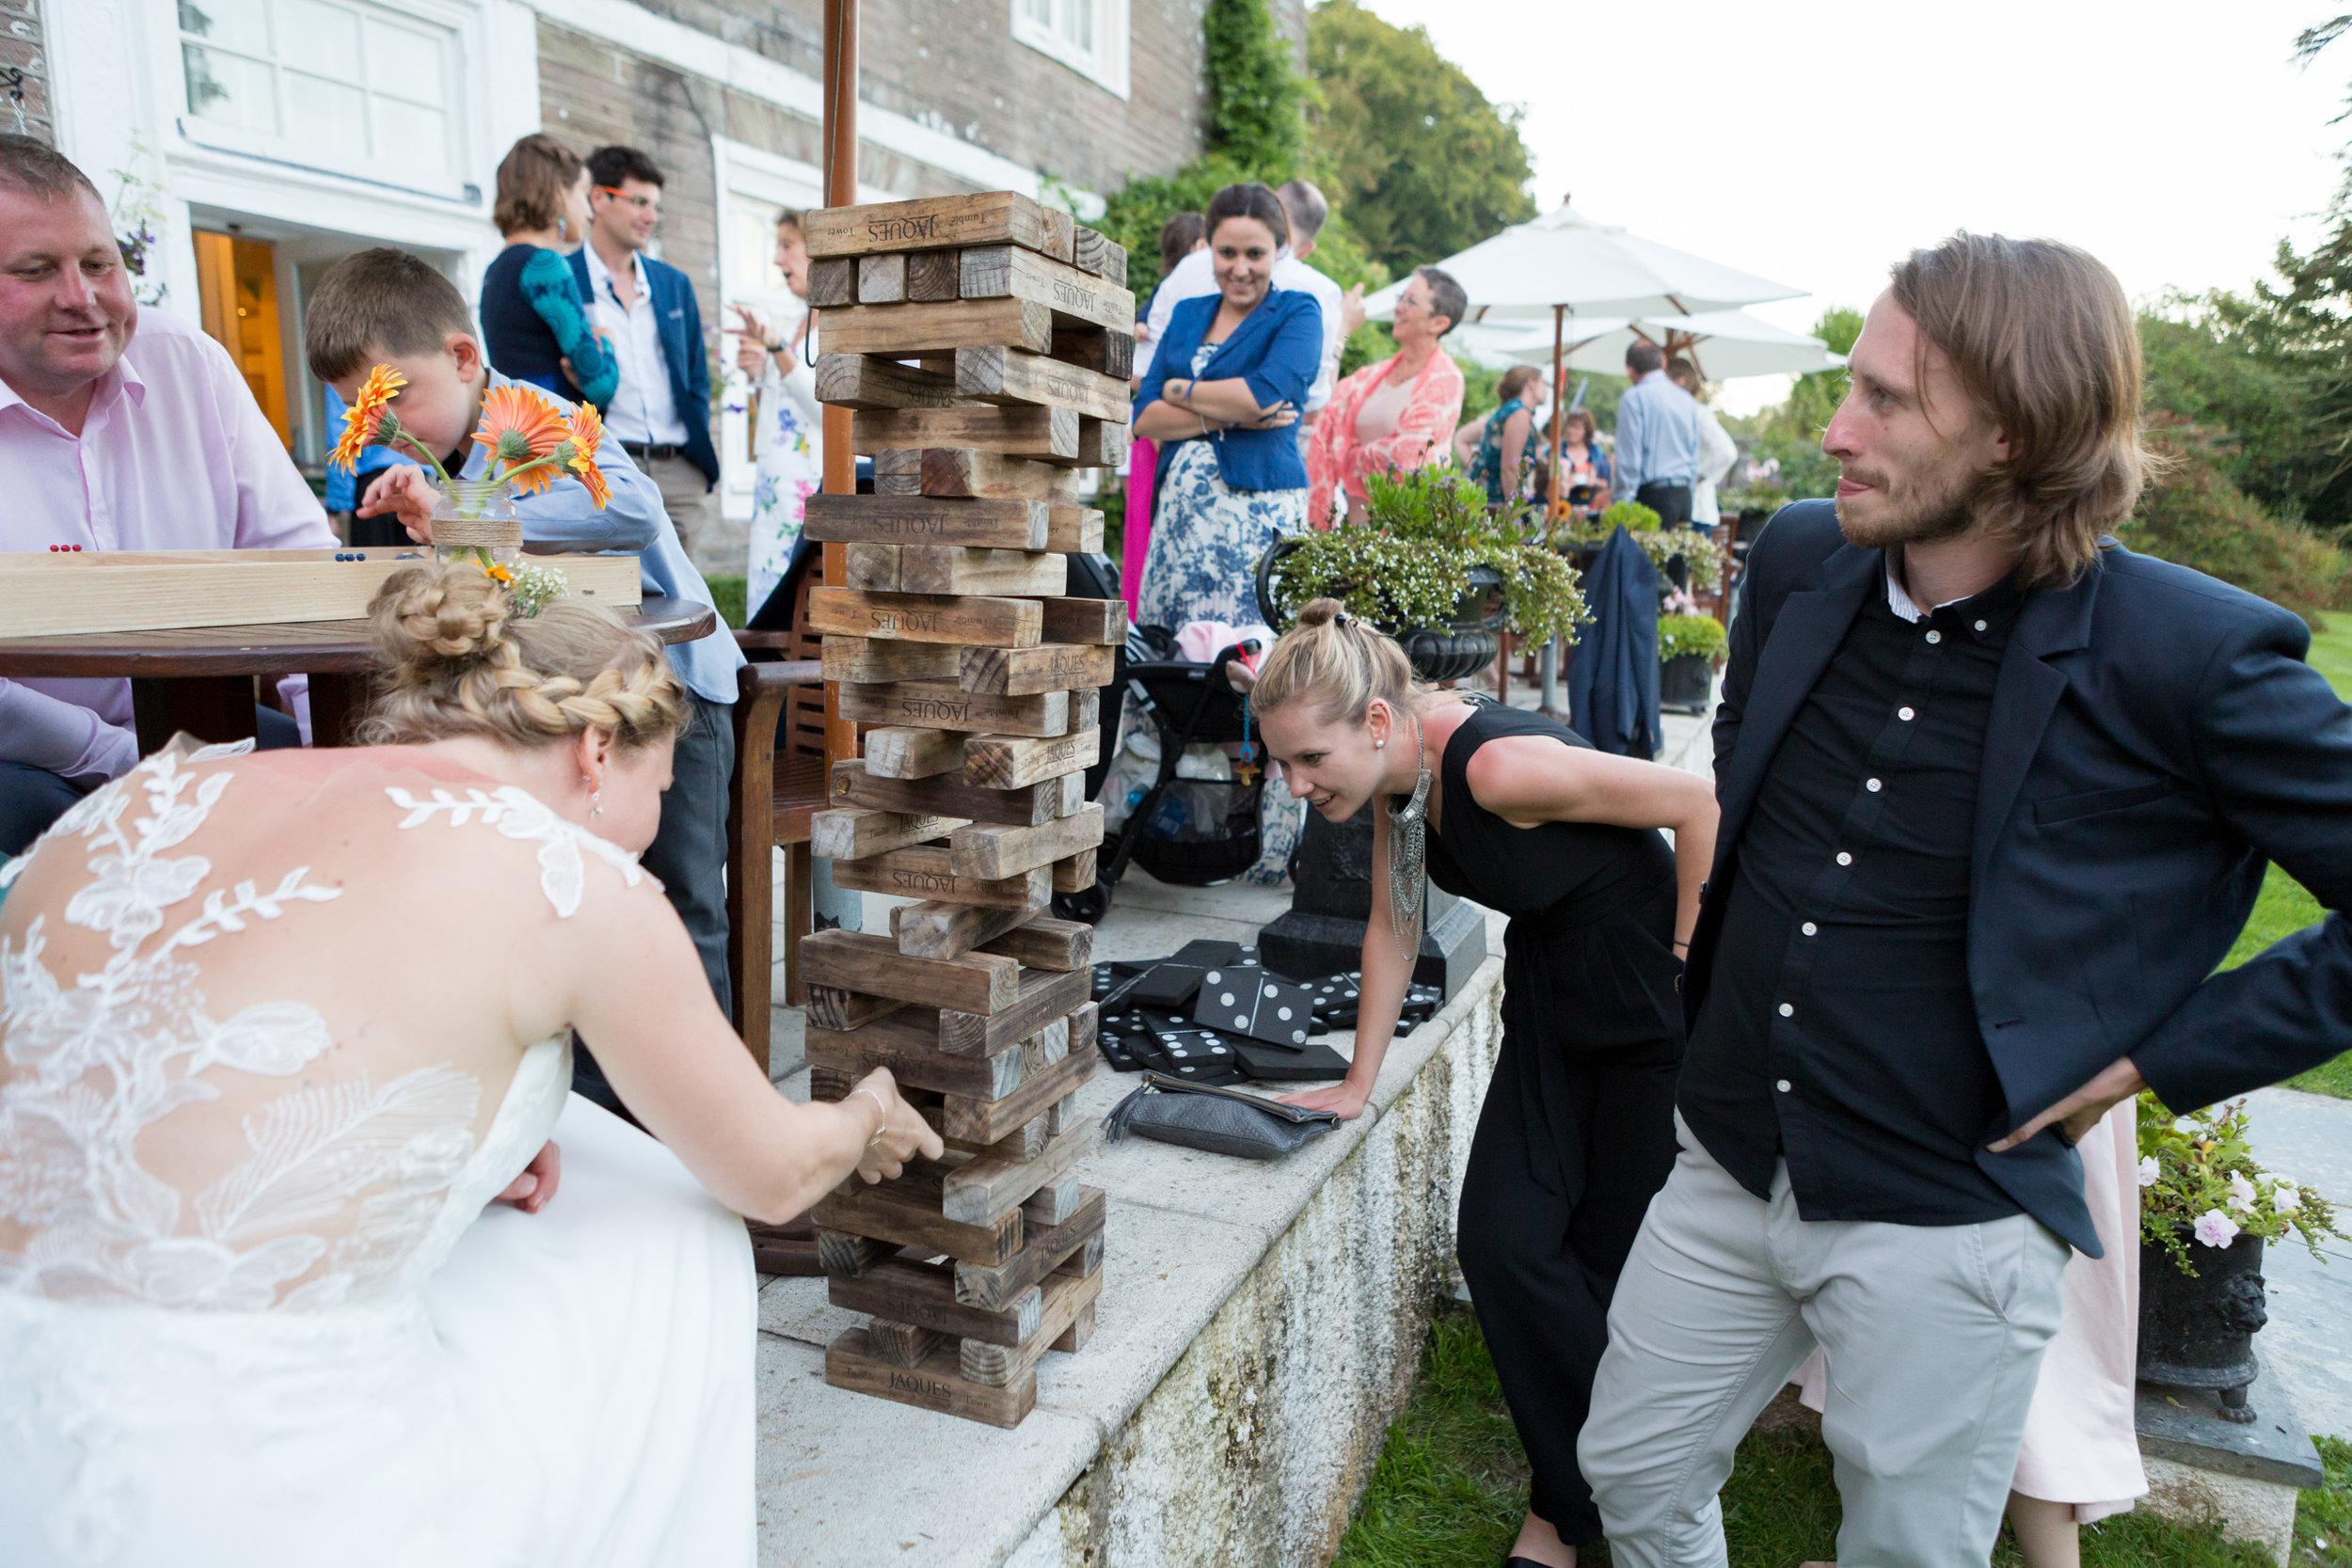 Bucklands-Tout-Saints-Hotel-Devon-Wedding-Photography-33.jpg